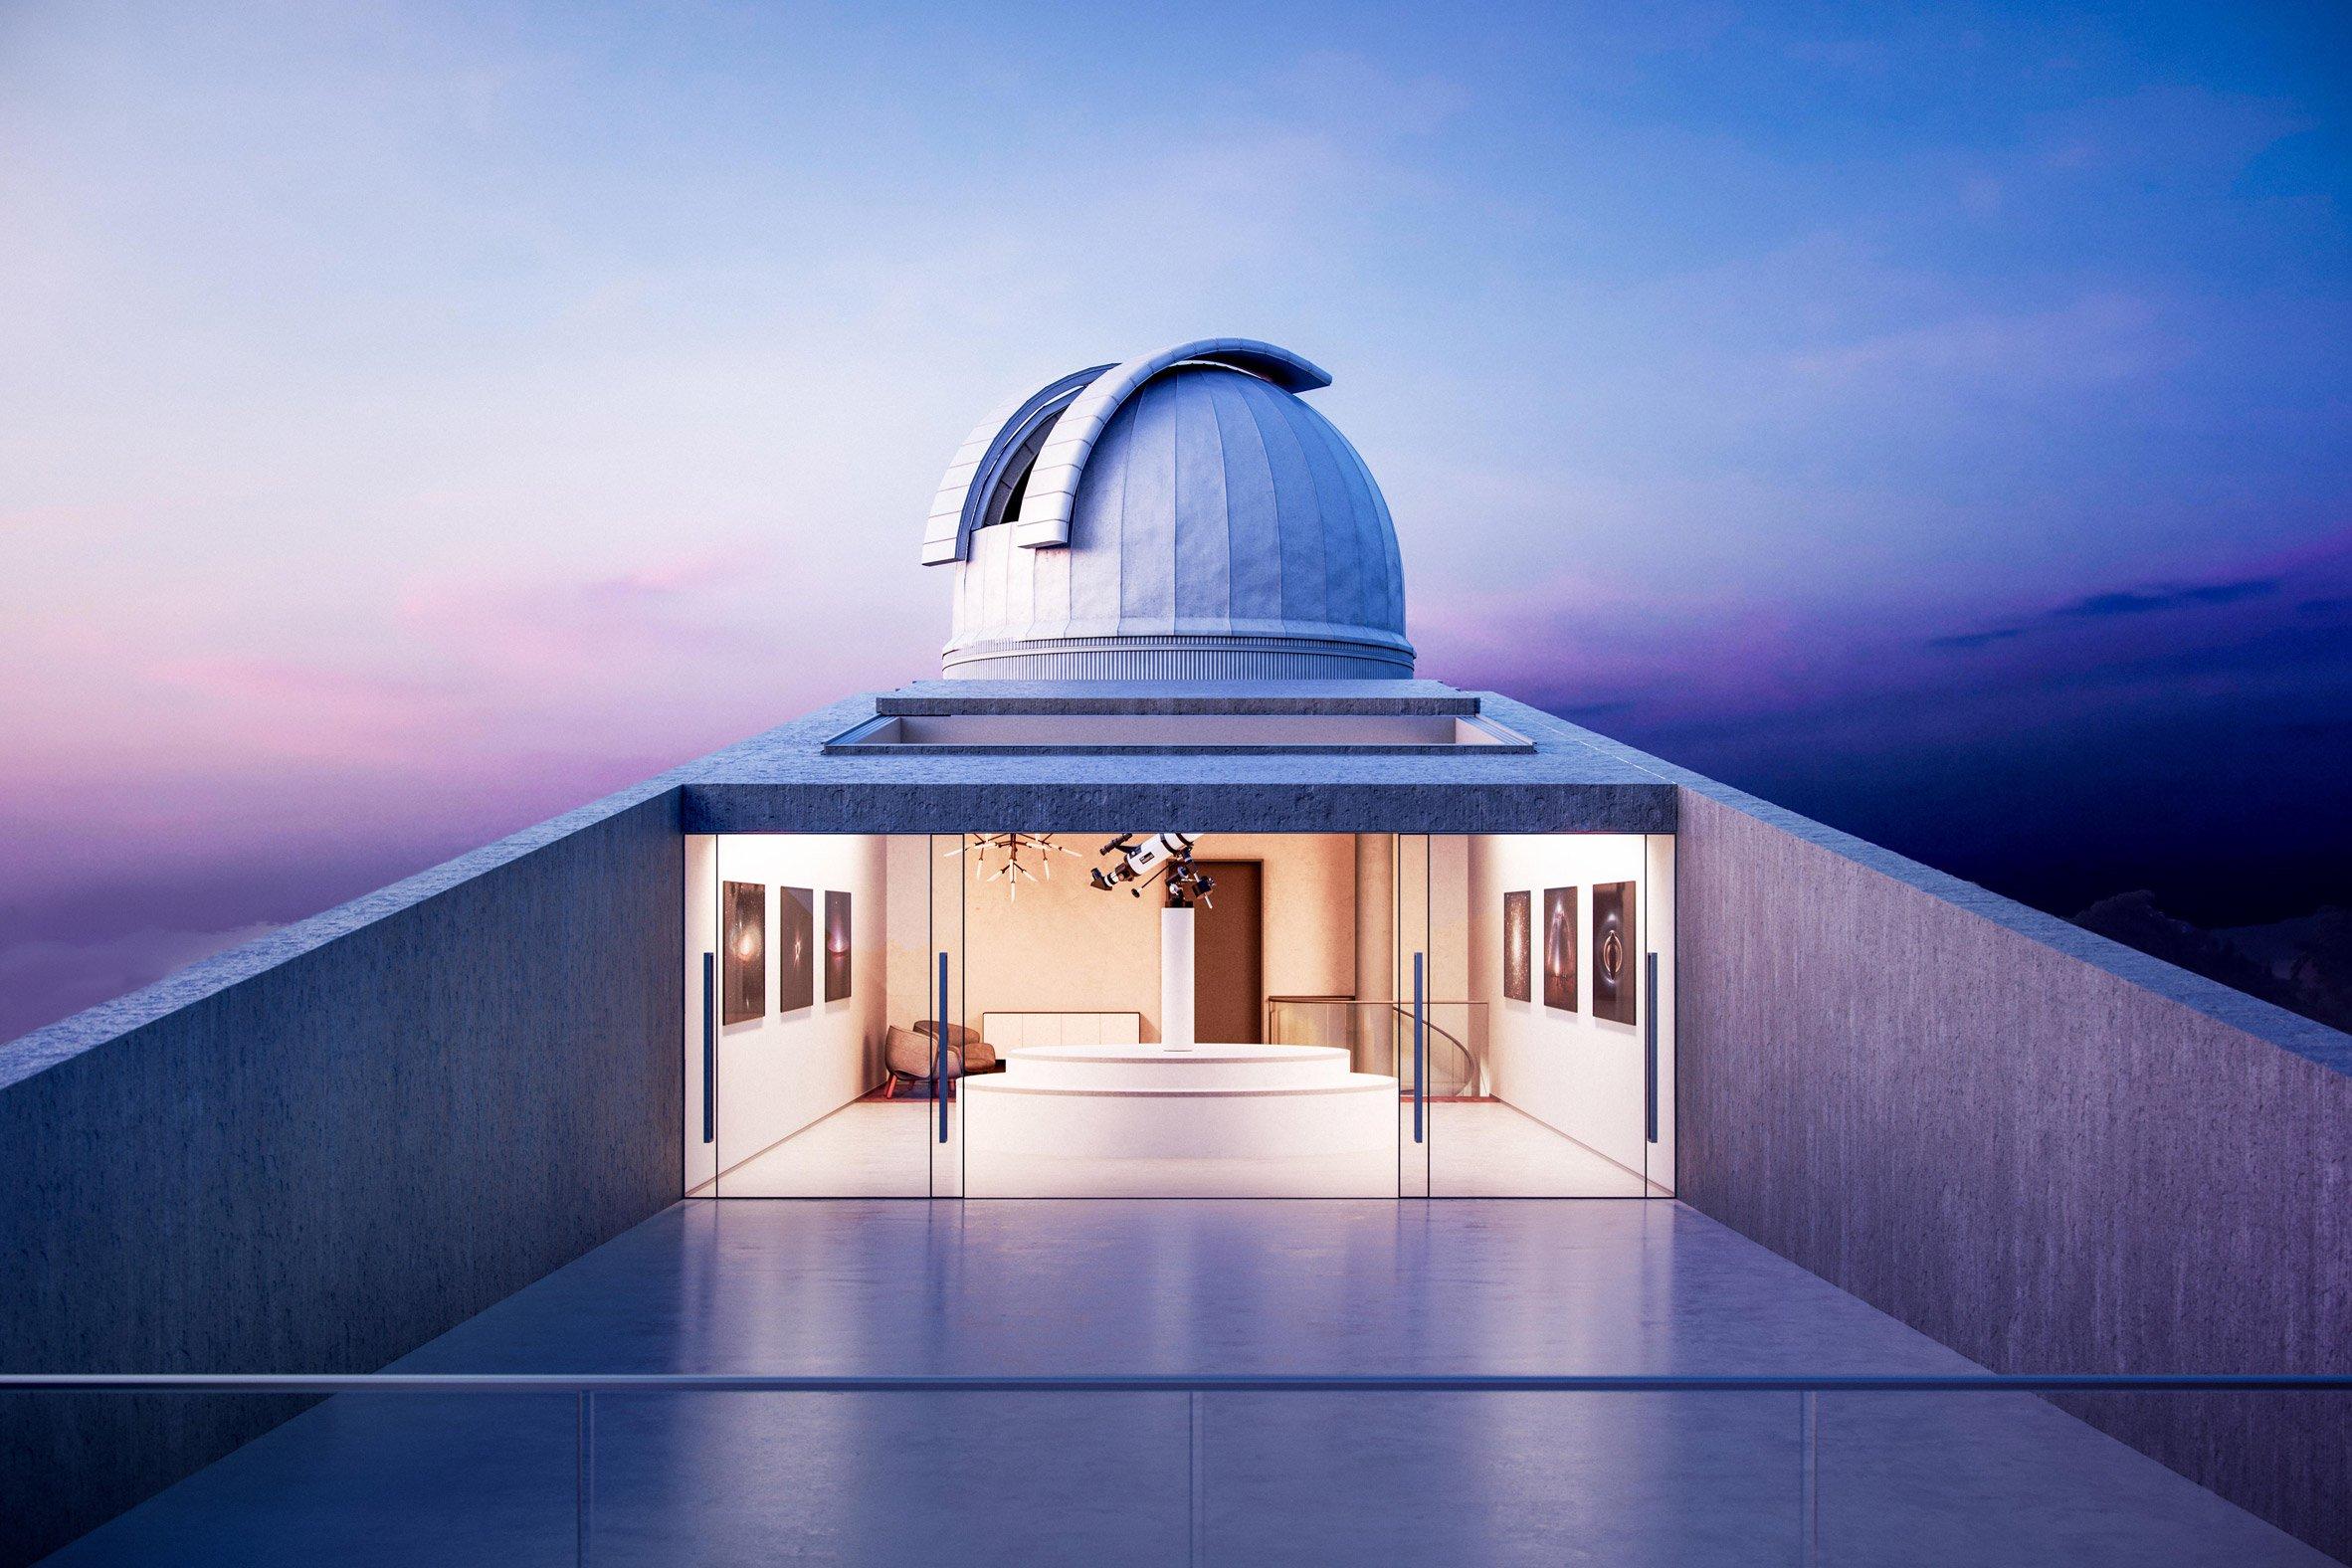 star observatory kyriakos tsolakis architecture news dezeen 2364 col 2 - An observatory inspire in Star Wars films